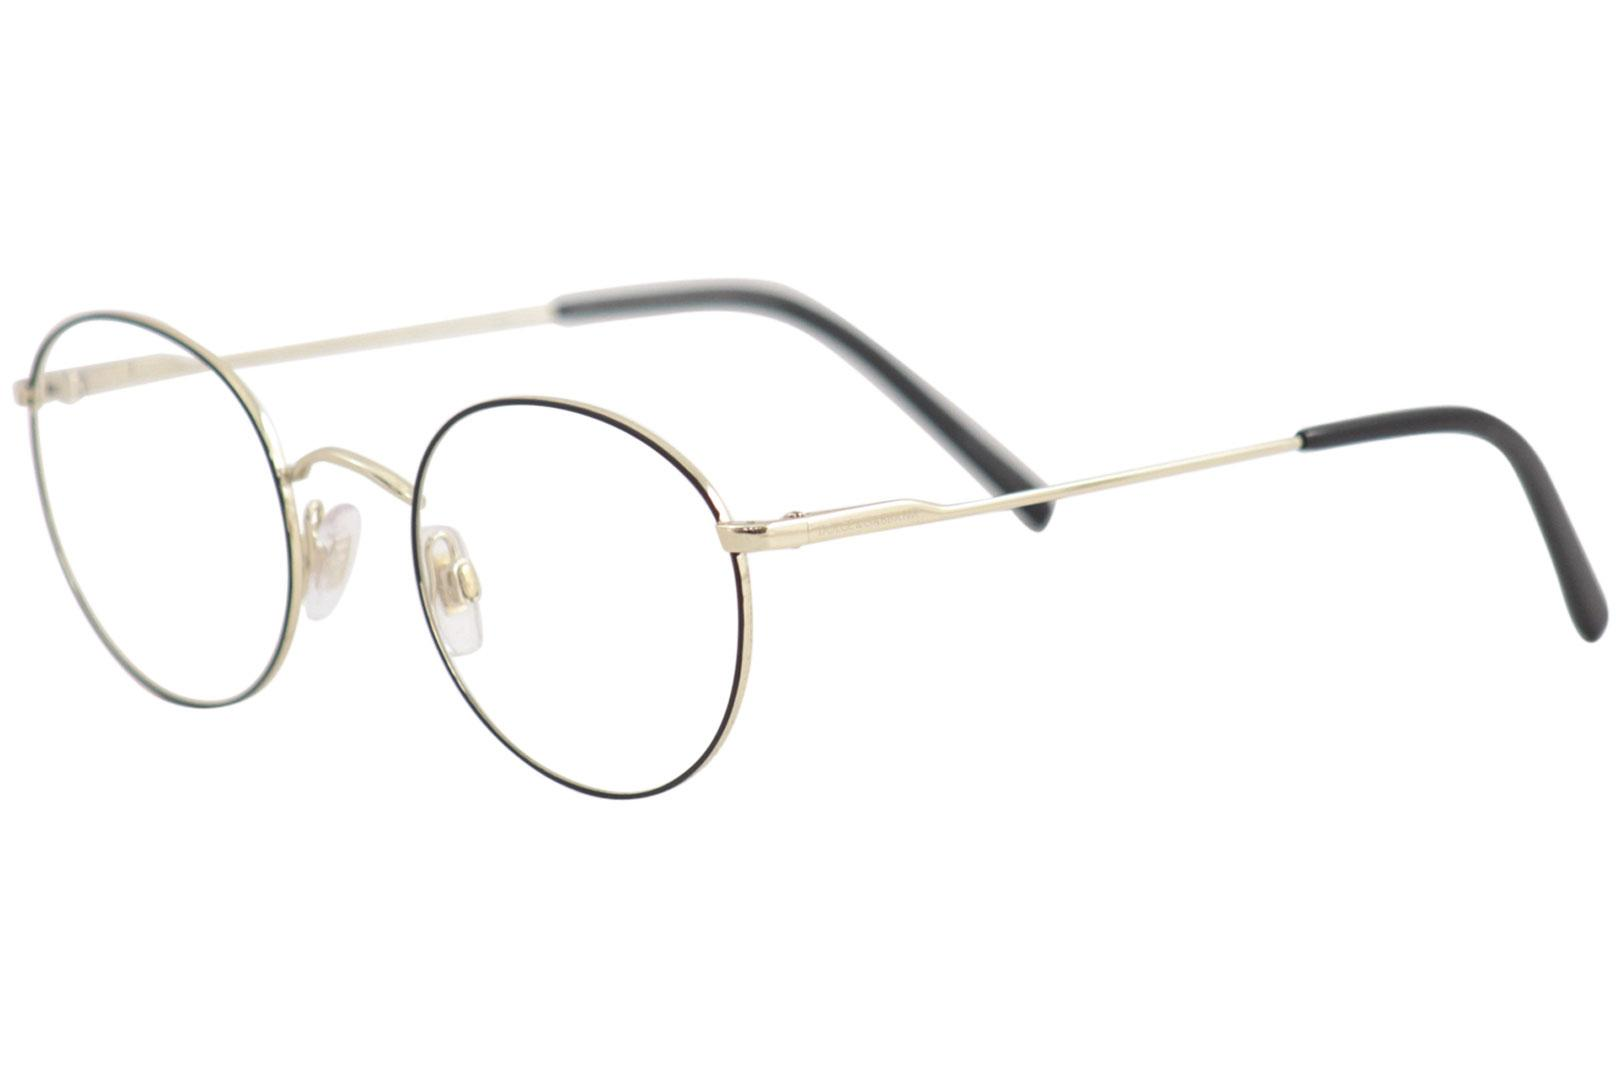 13a5434182e7 Dolce   Gabbana Eyeglasses D G DG1290 DG 1290 1350 Mt Black Optical ...